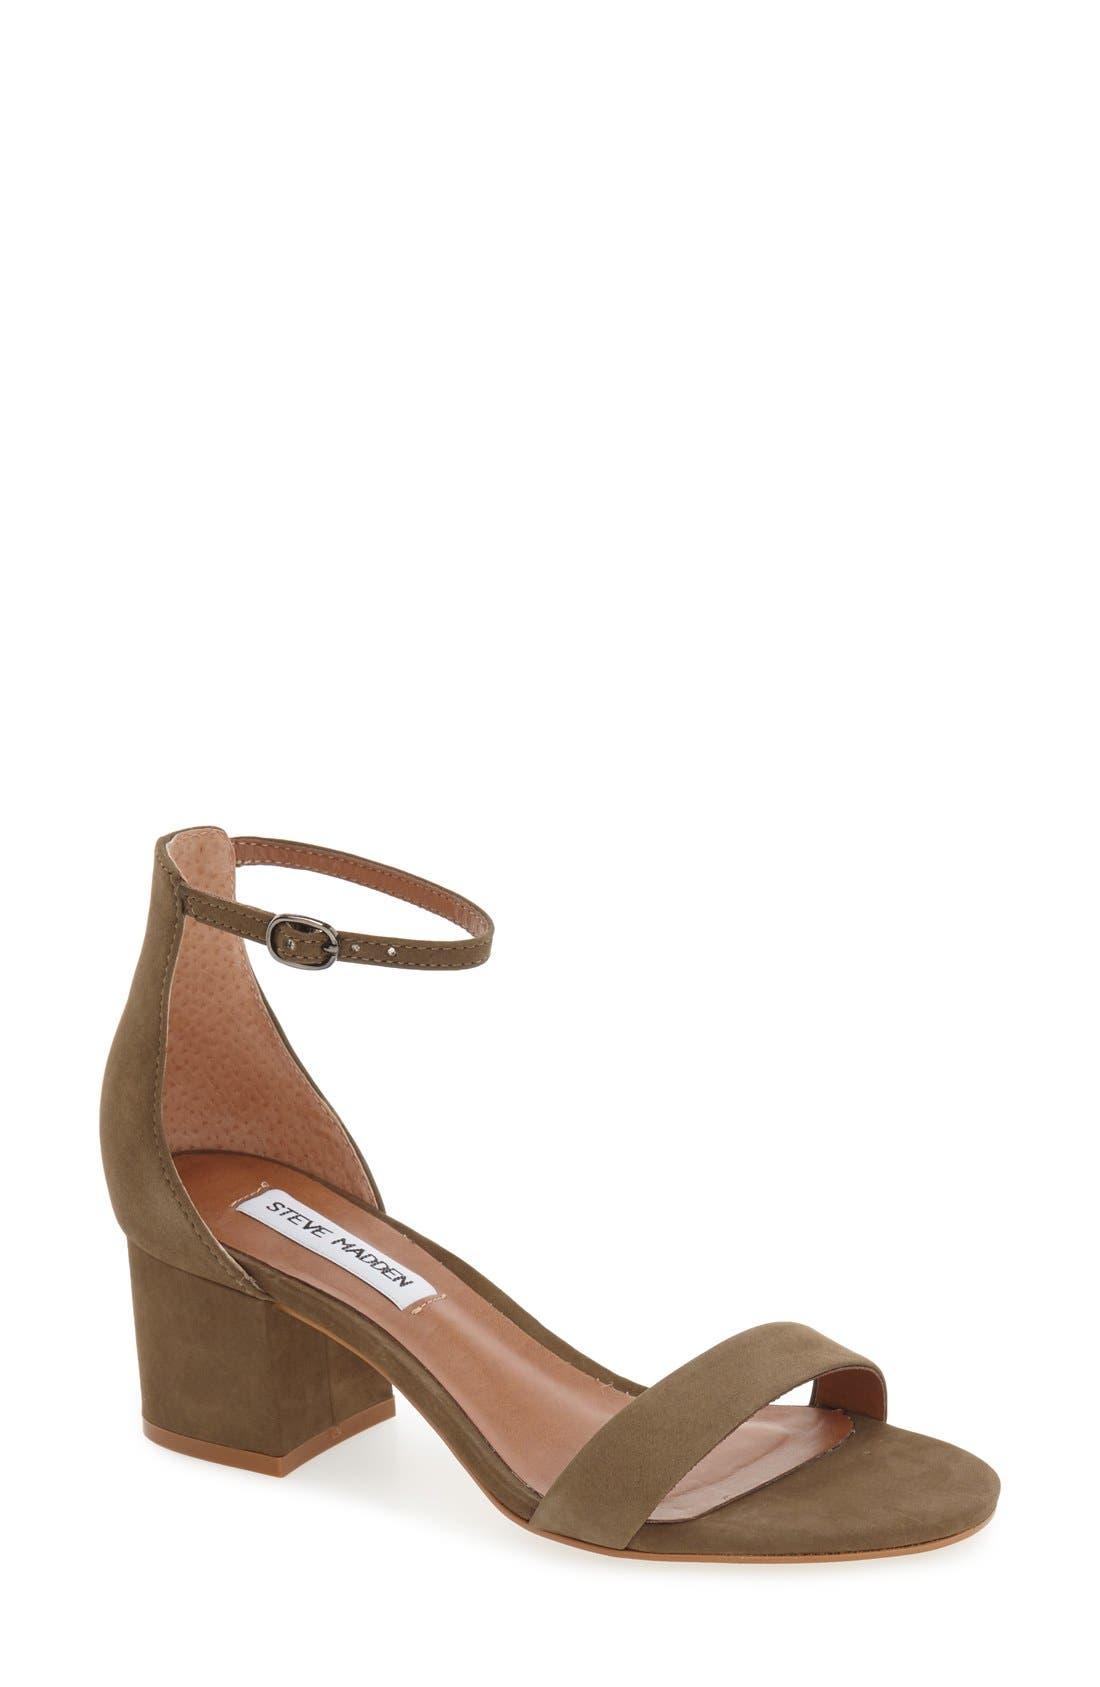 Irenee Ankle Strap Sandal,                             Main thumbnail 22, color,